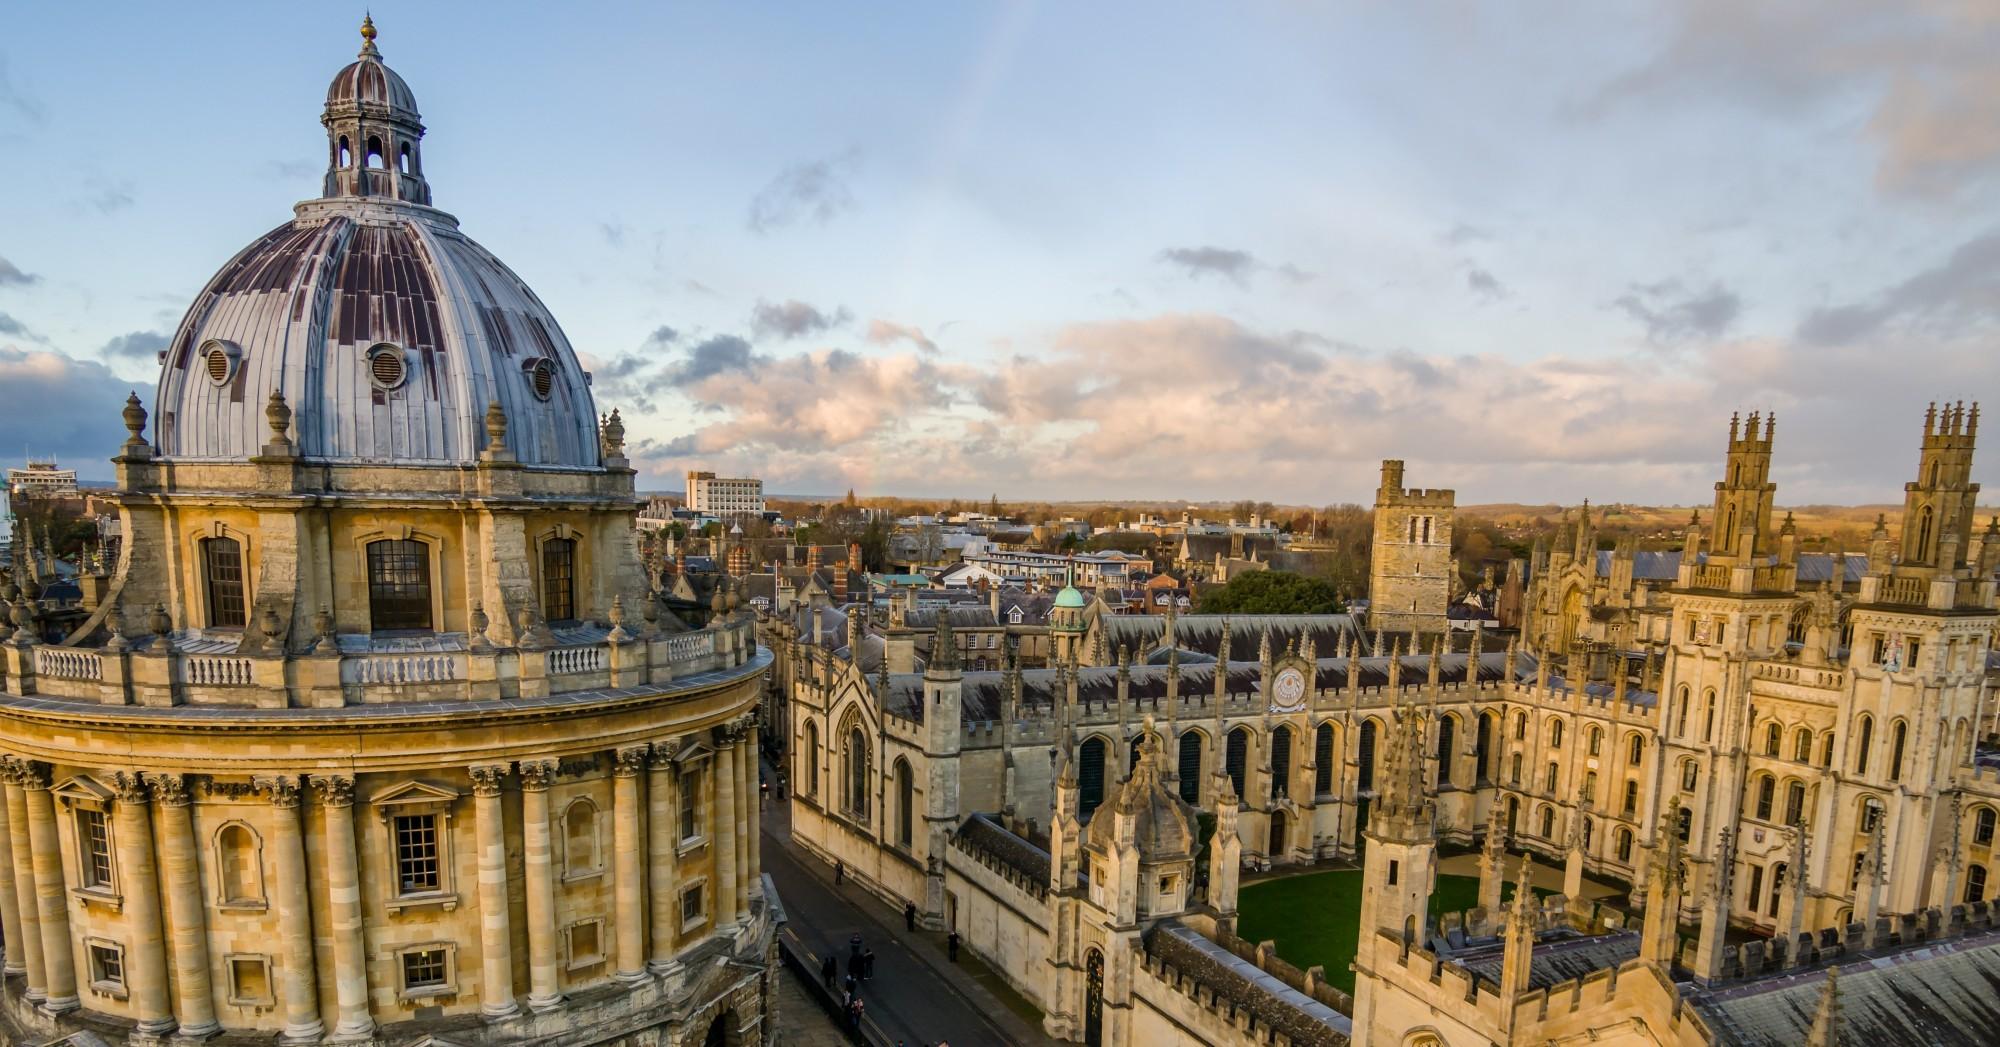 Universidade de Oxford, Reino Unido.